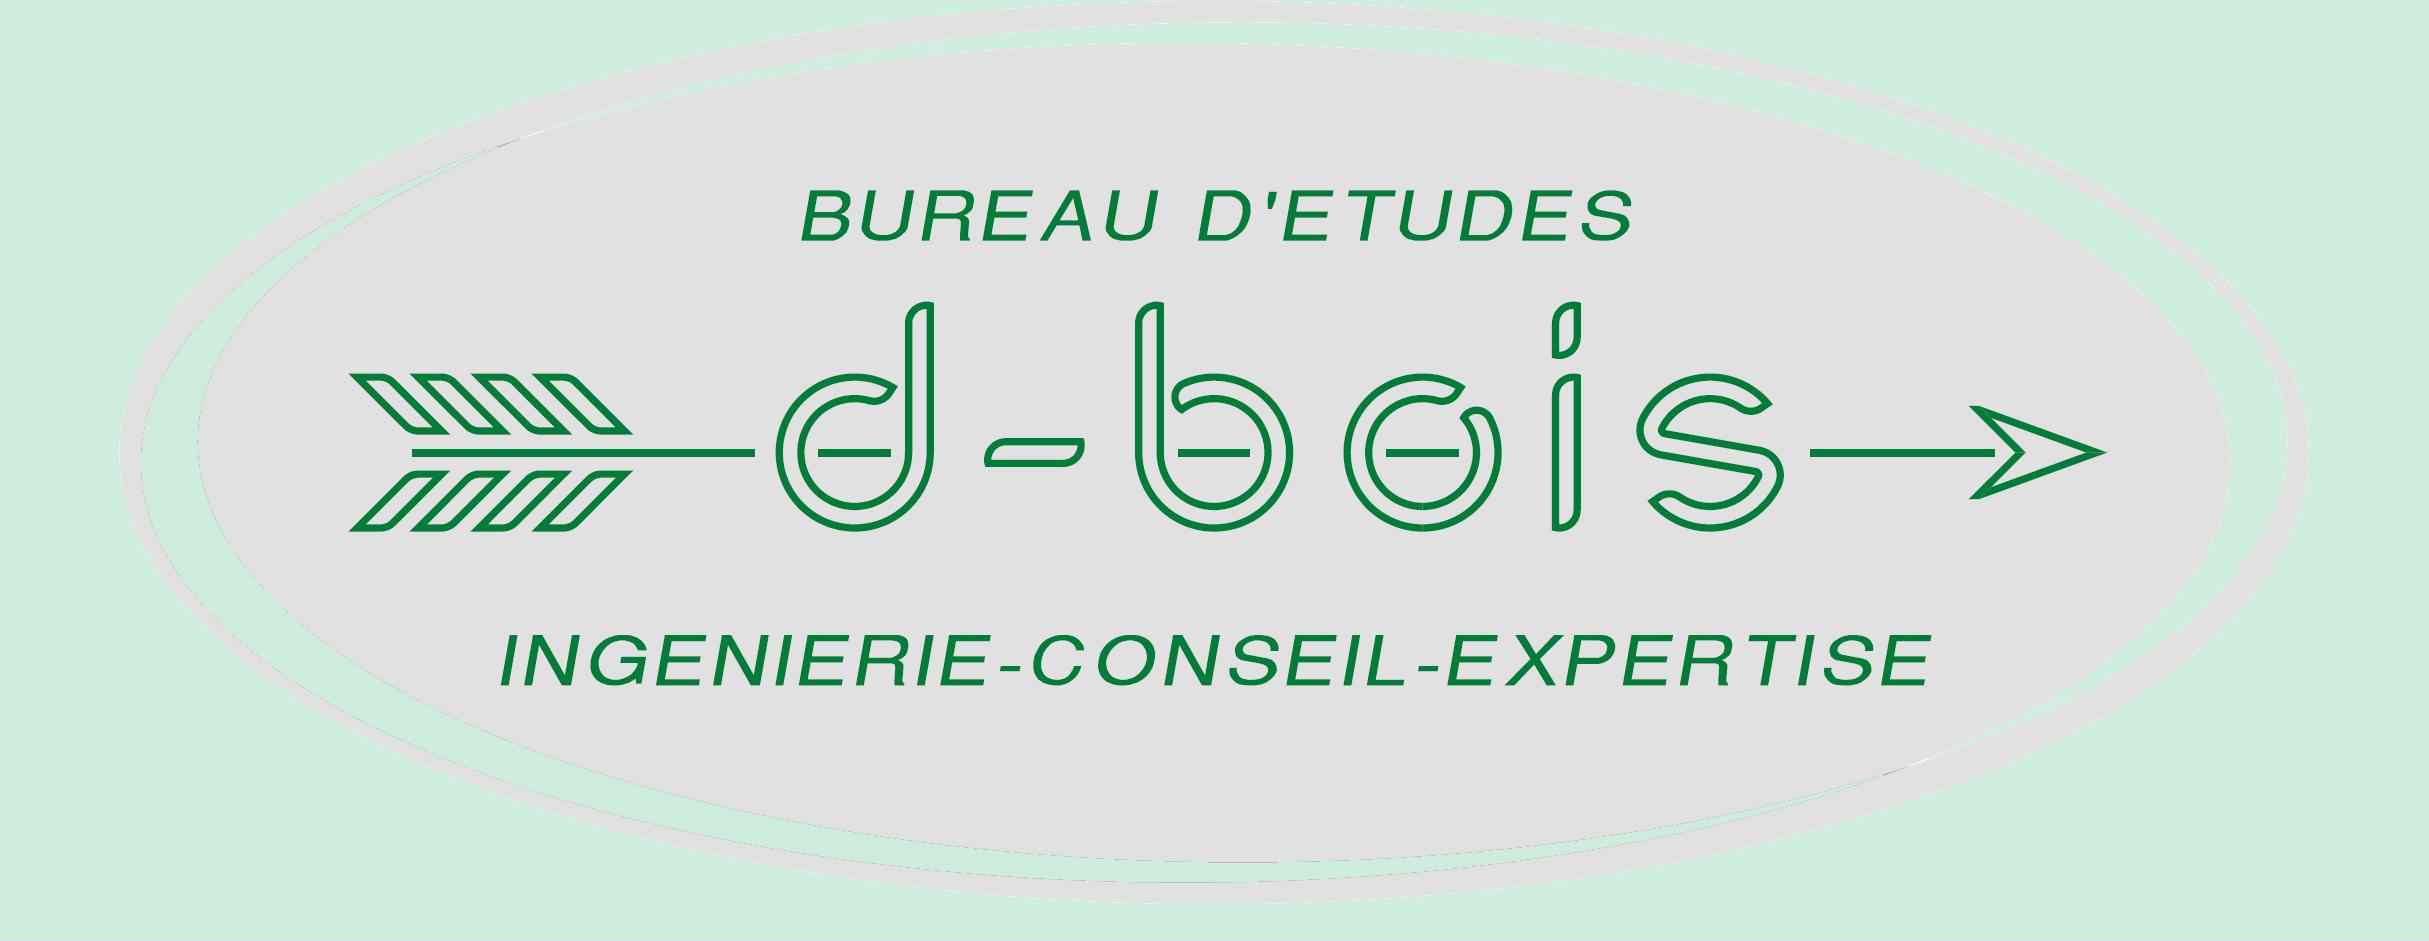 d-bois.fr